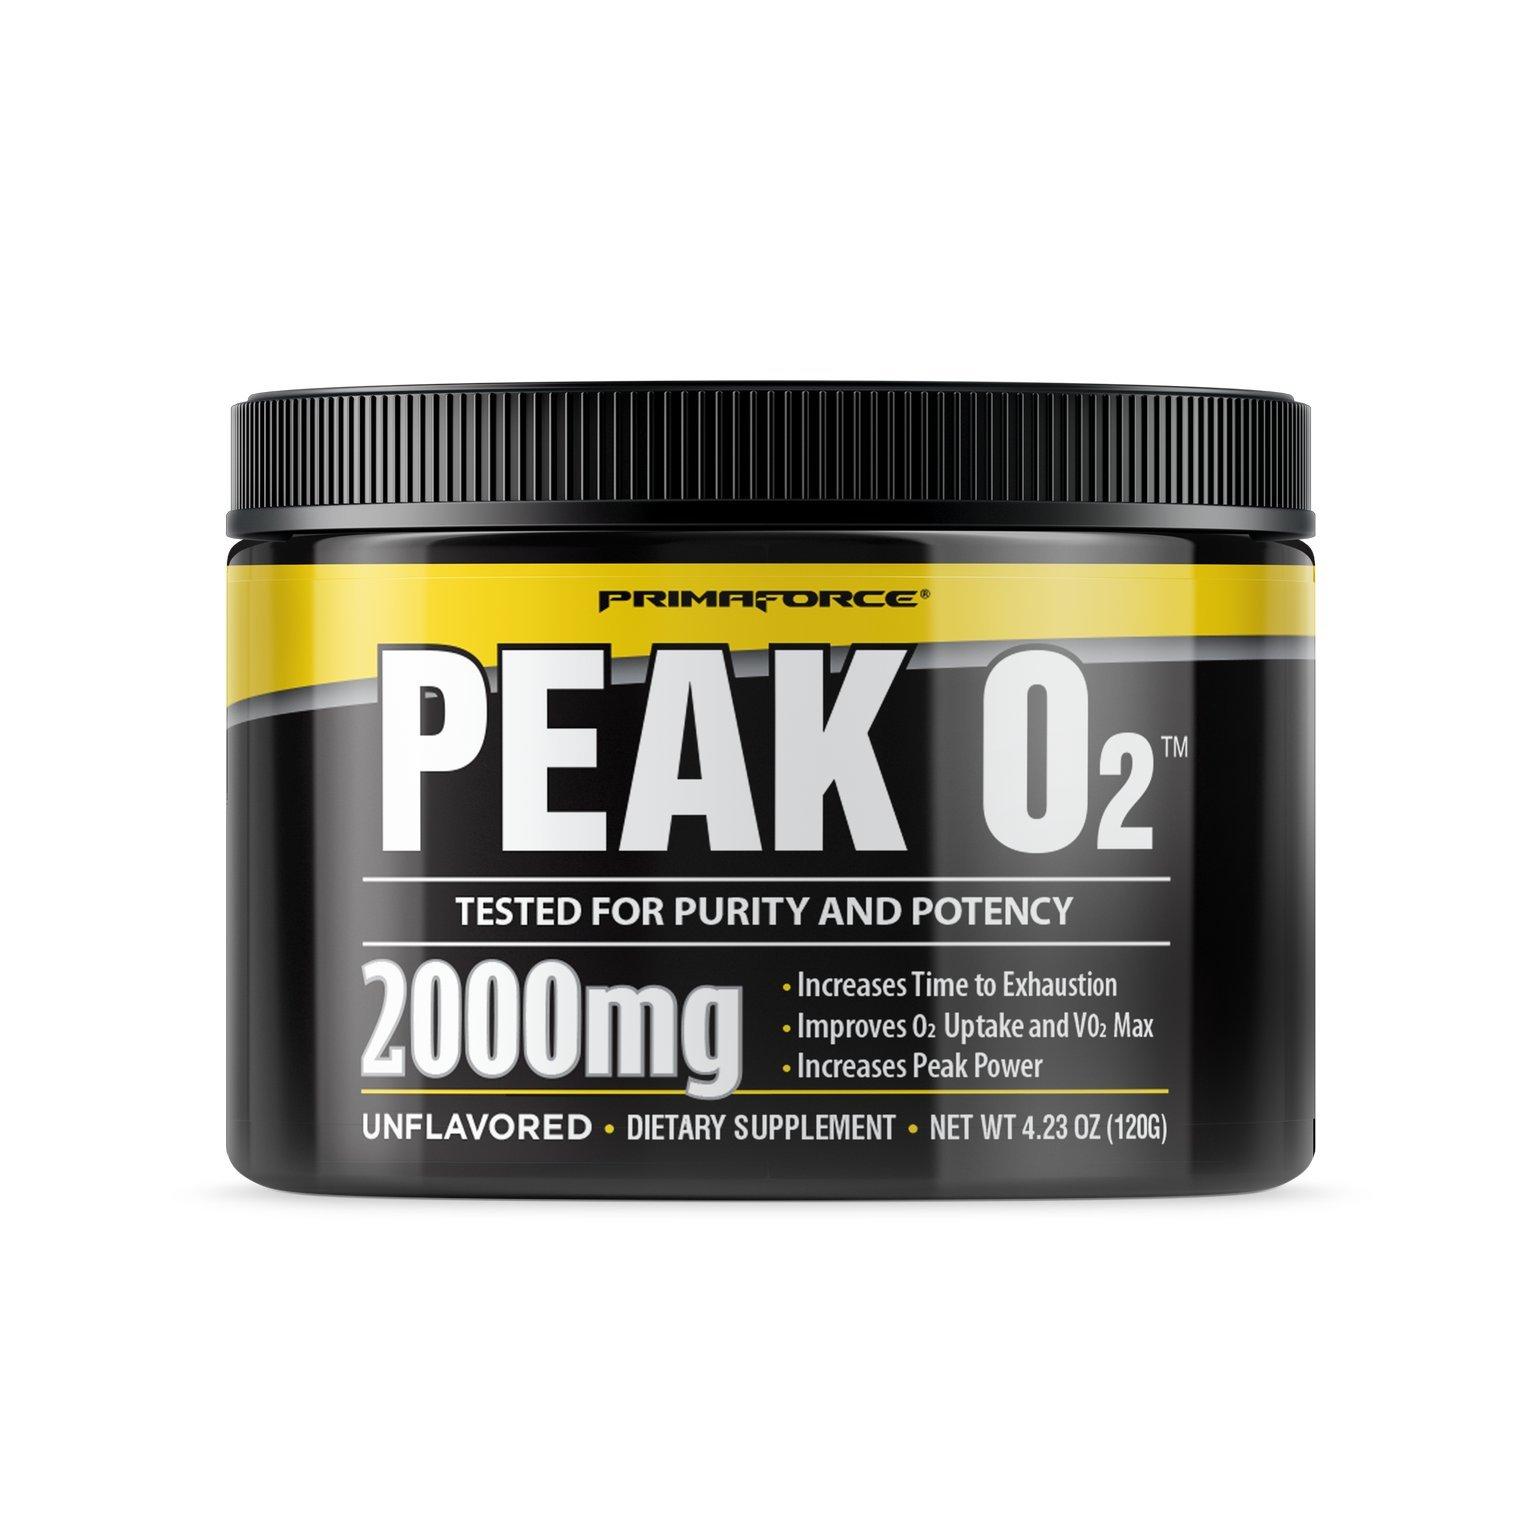 PrimaForce Peak O2 Powder Supplement, 120 Grams – Improves O2 Uptake & VO2 Max / Increases Time to Exhaustion / Enhances Peak Power